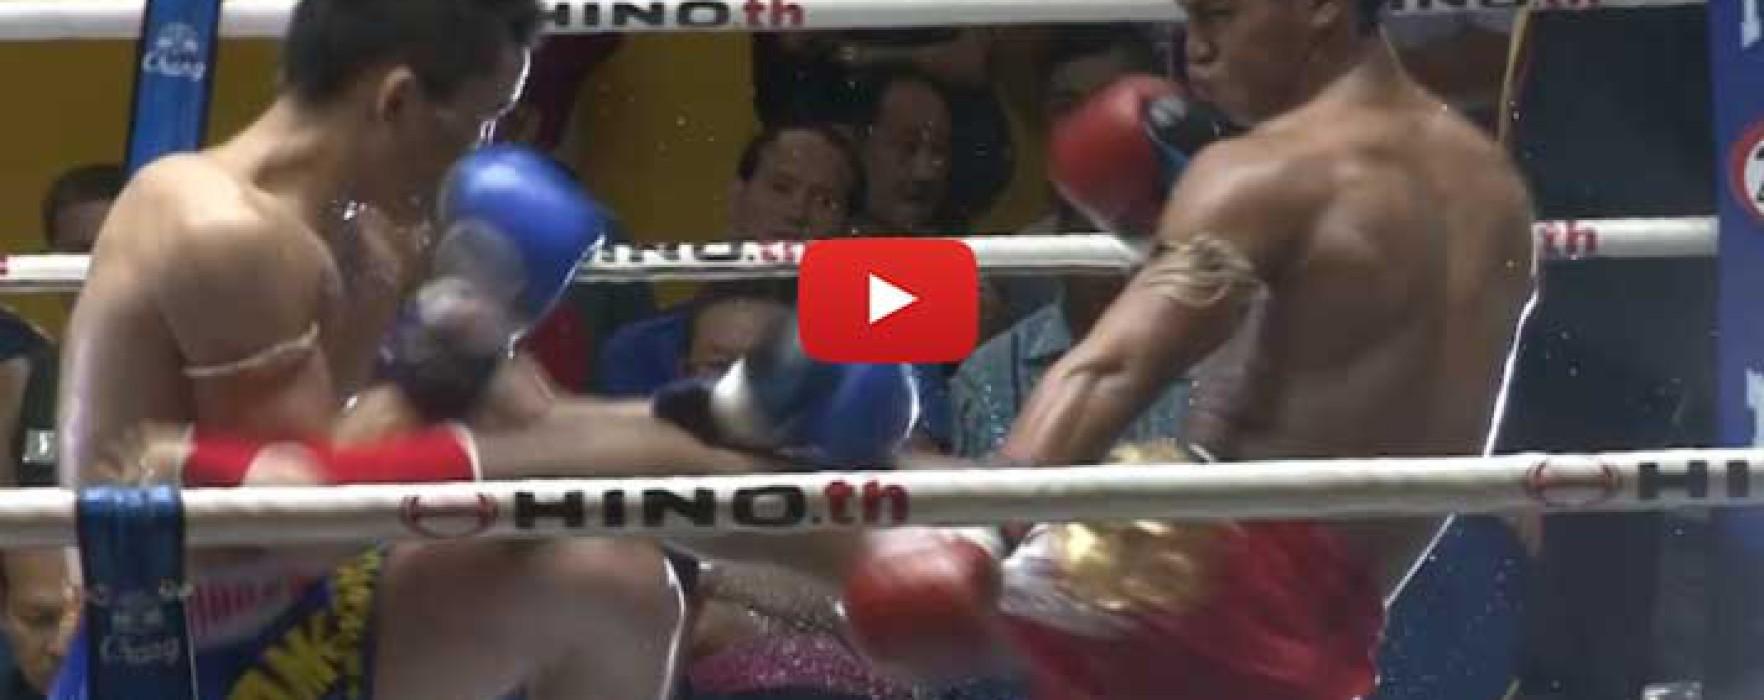 Video: Petphanomrung vs Kwankhao and Morakod vs Sakpetch – Lumpinee – 10/7/15